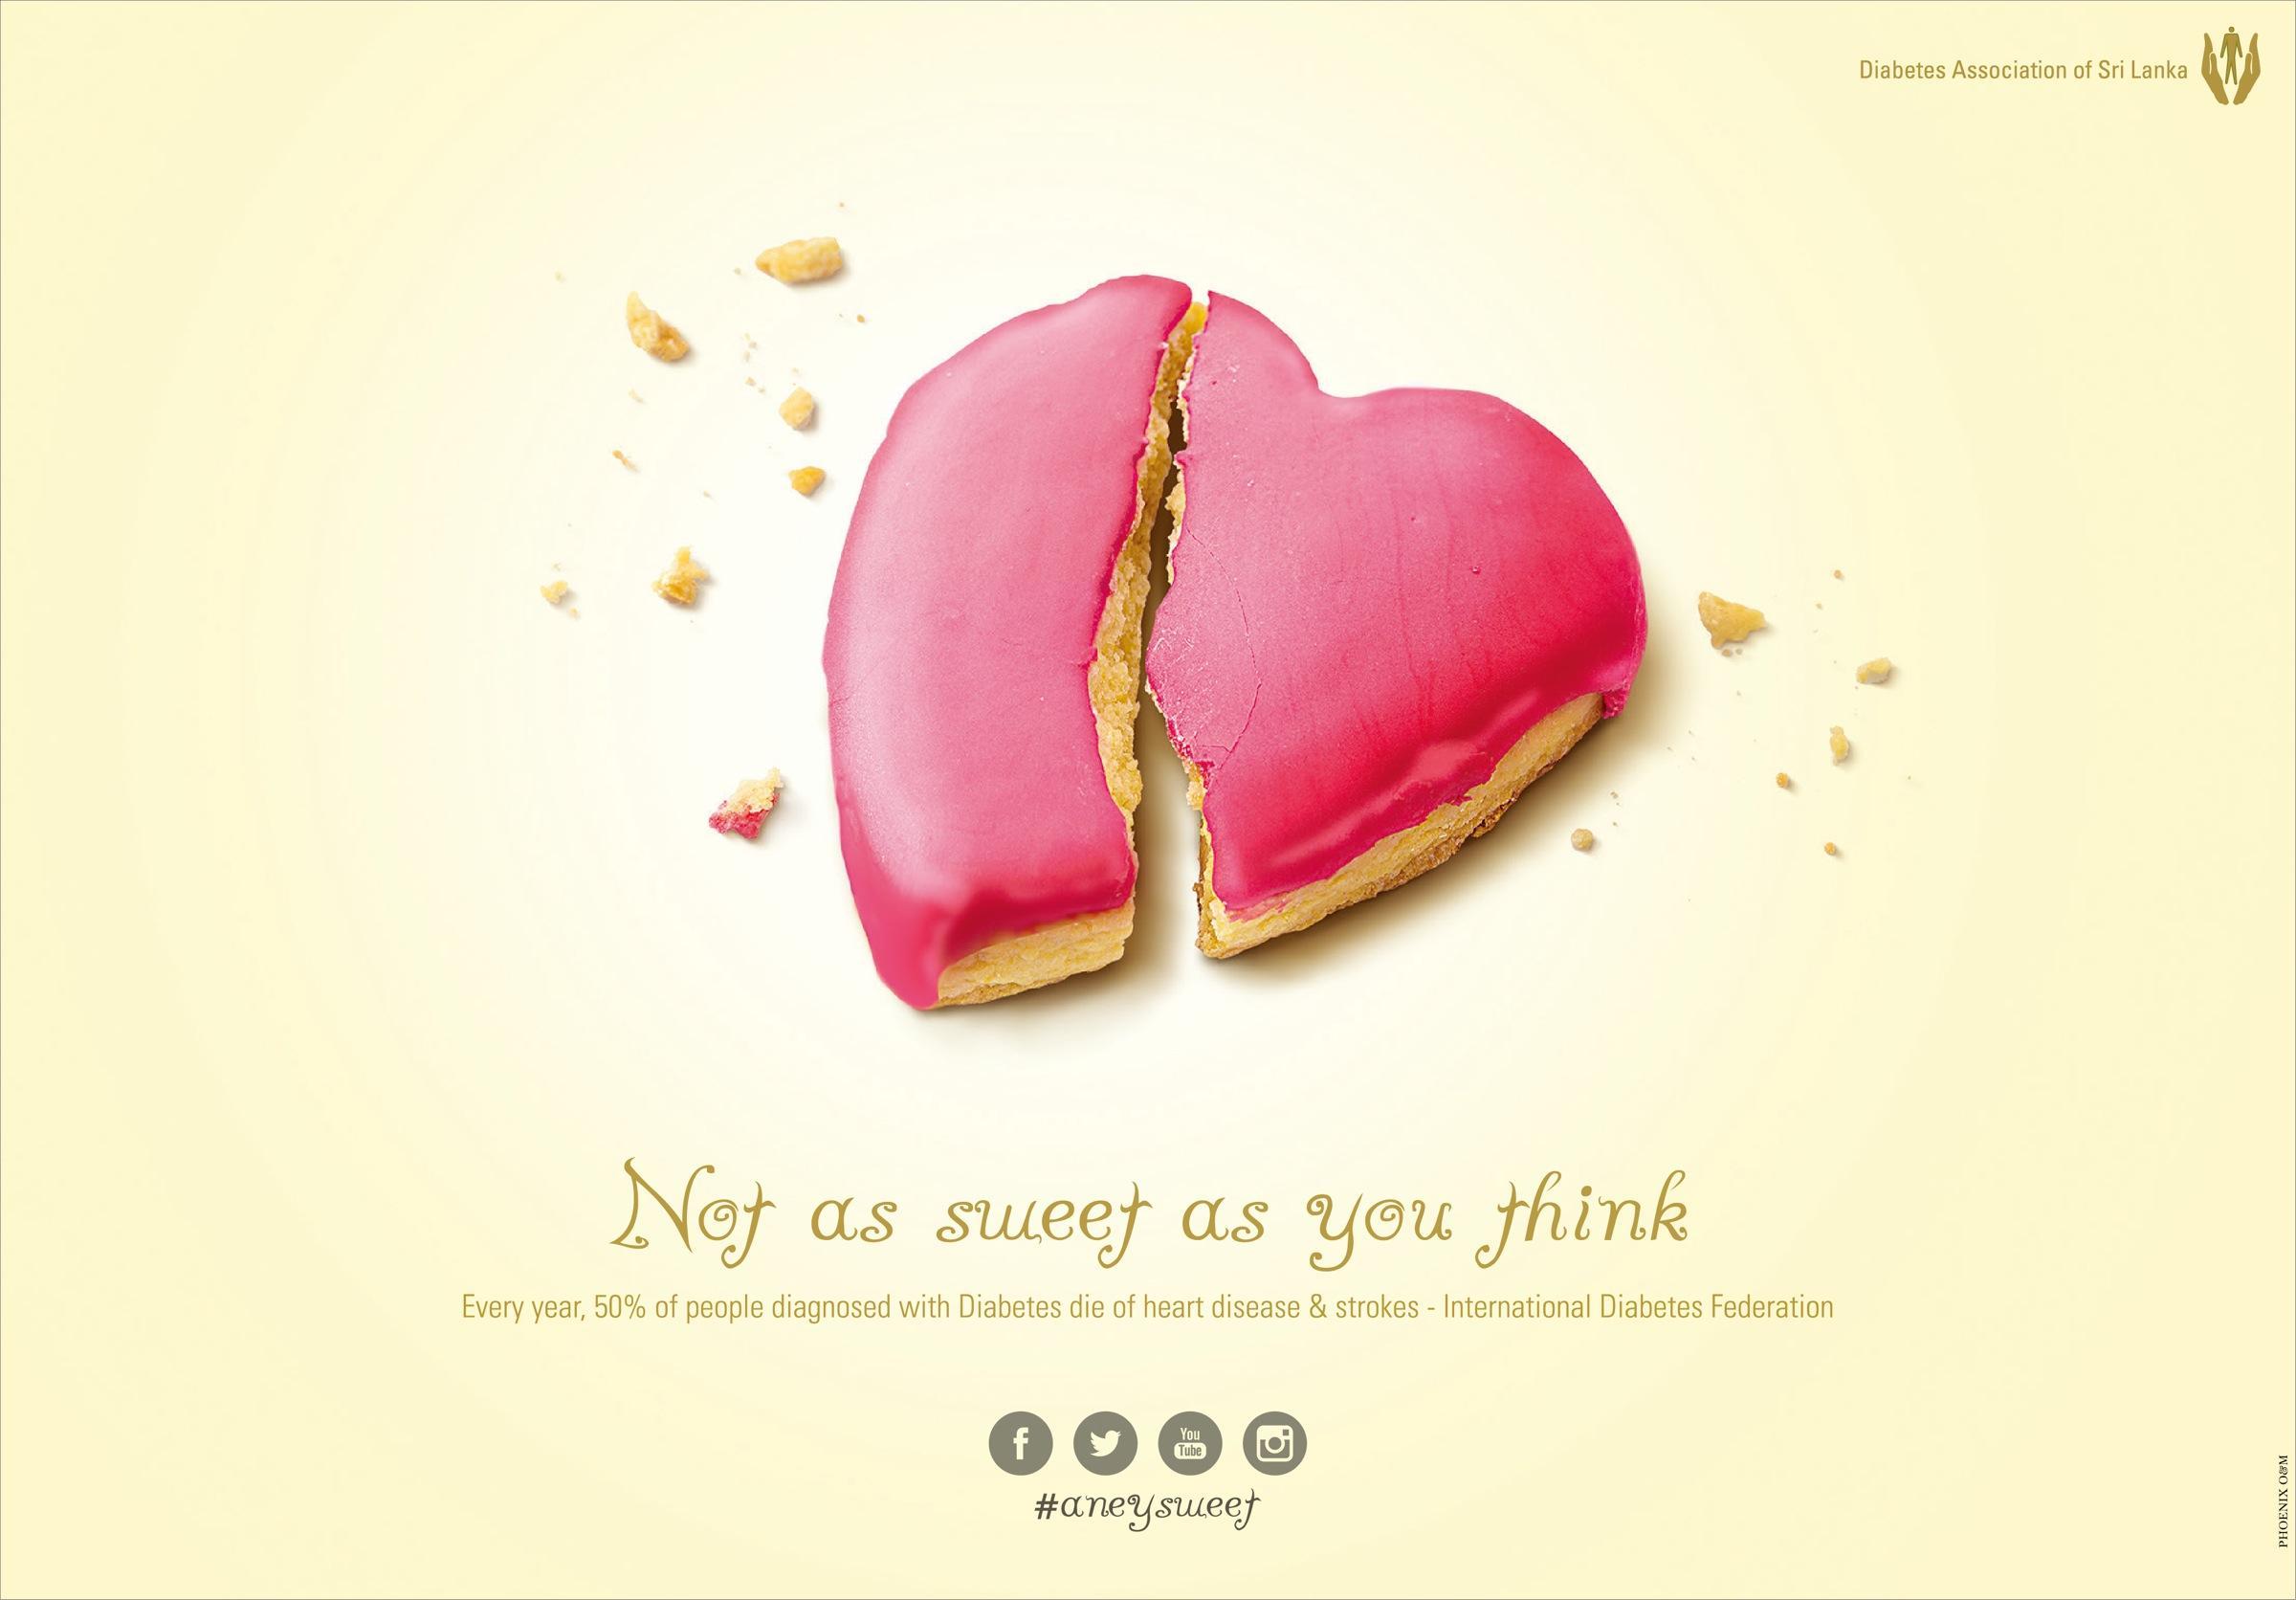 Diabetes Association of Sri Lanka Print Ad -  Not as sweet, 3